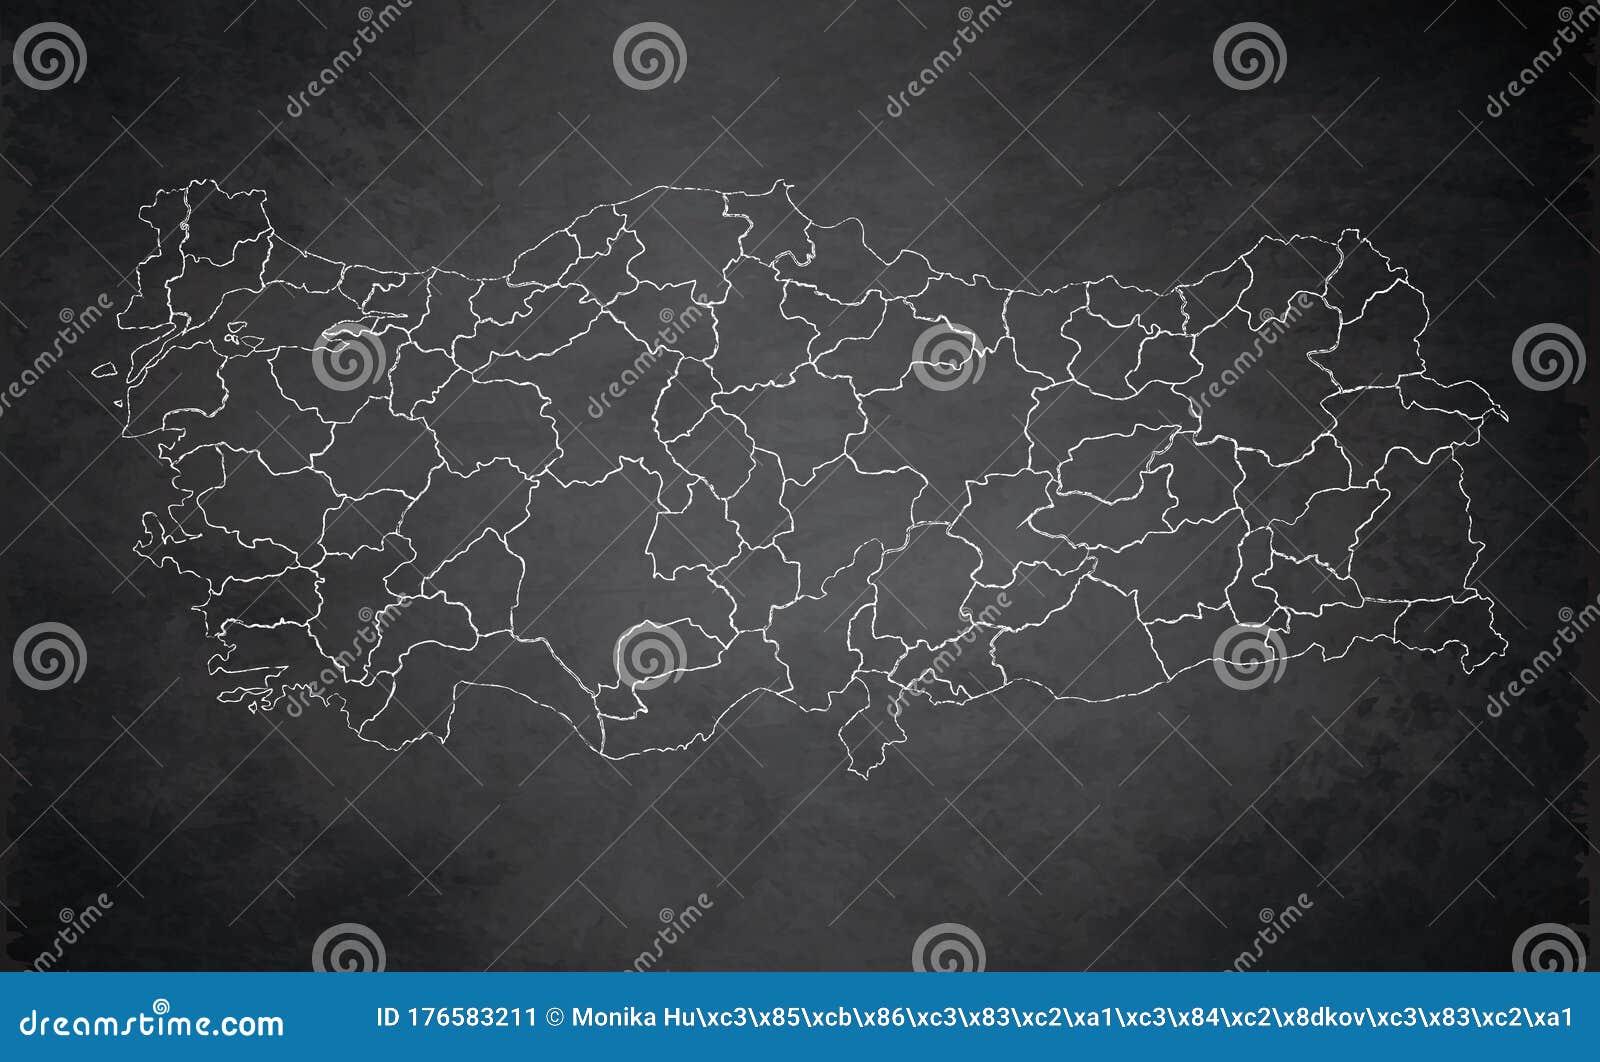 Turkey Map Design Card Blackboard Chalkboard Blank Stock Vector Illustration Of Chalk Asia 176583211